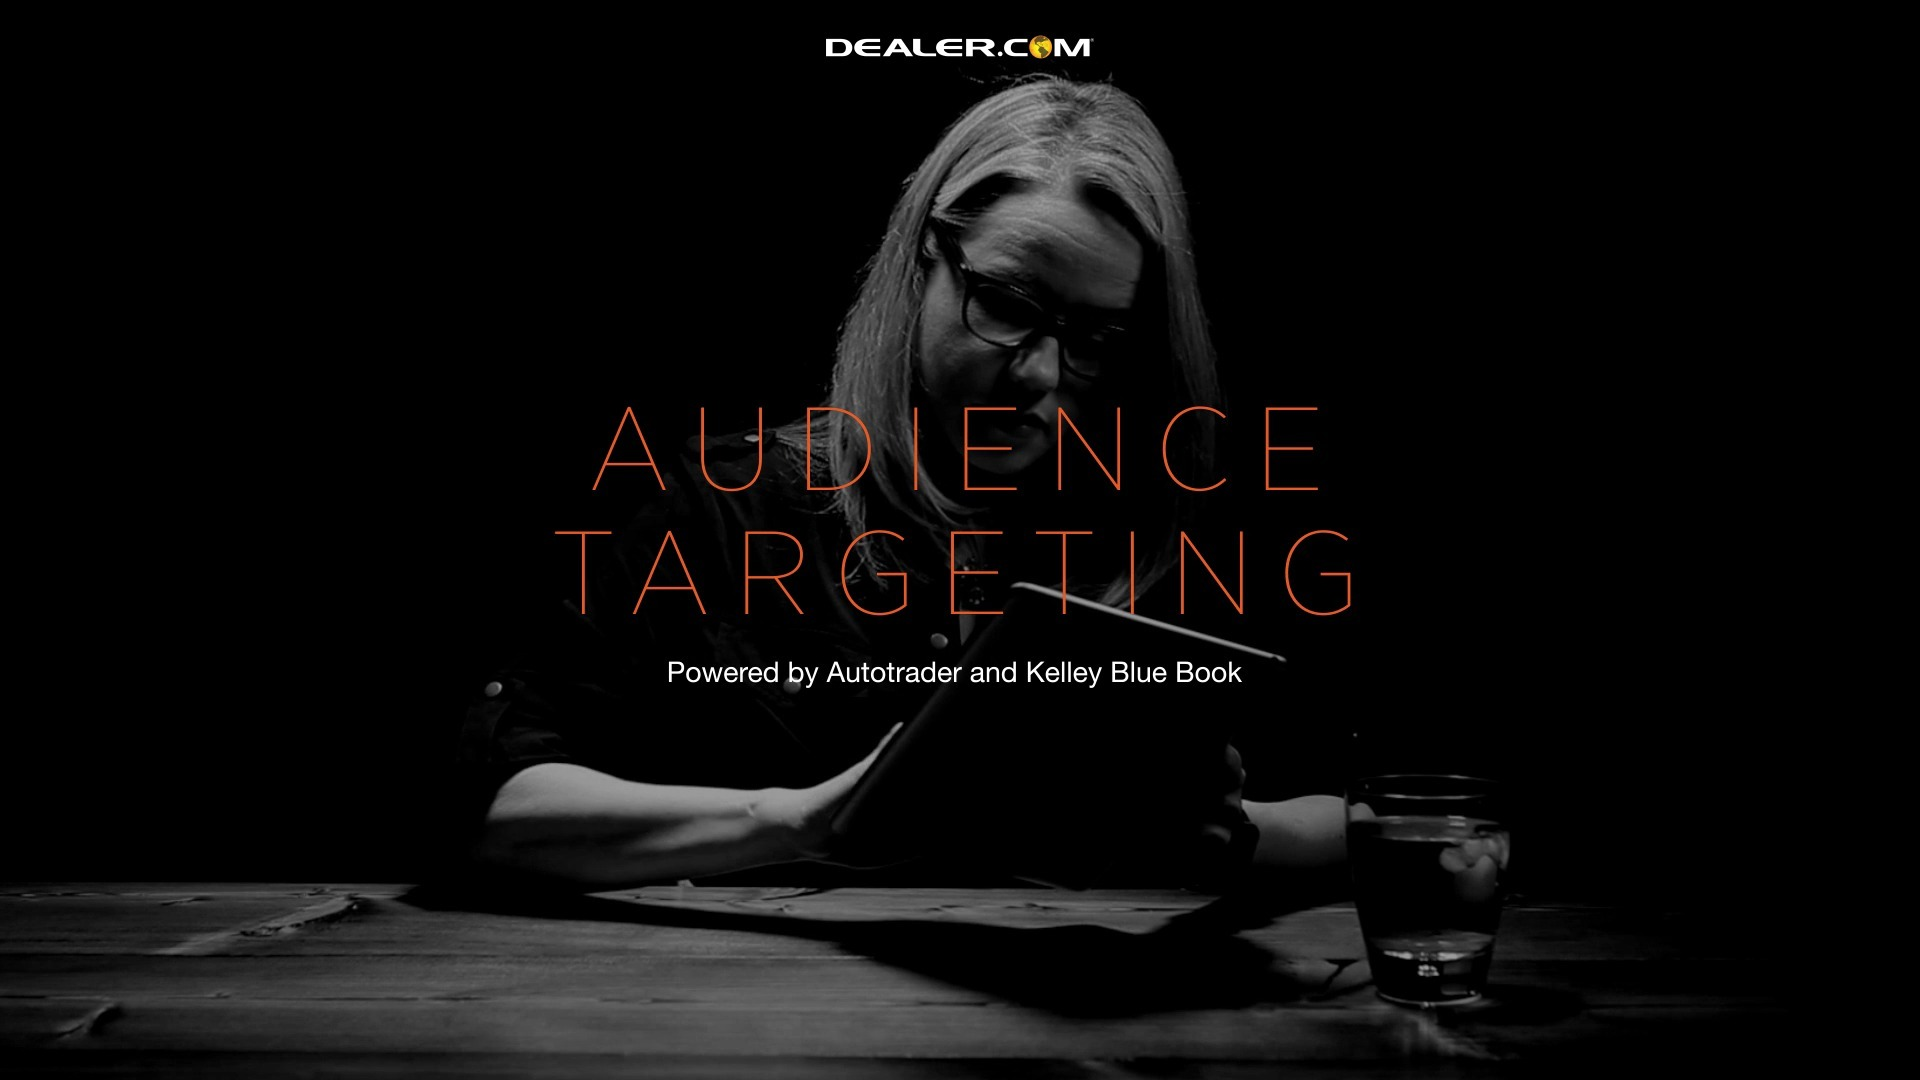 Advertising -Dealer com